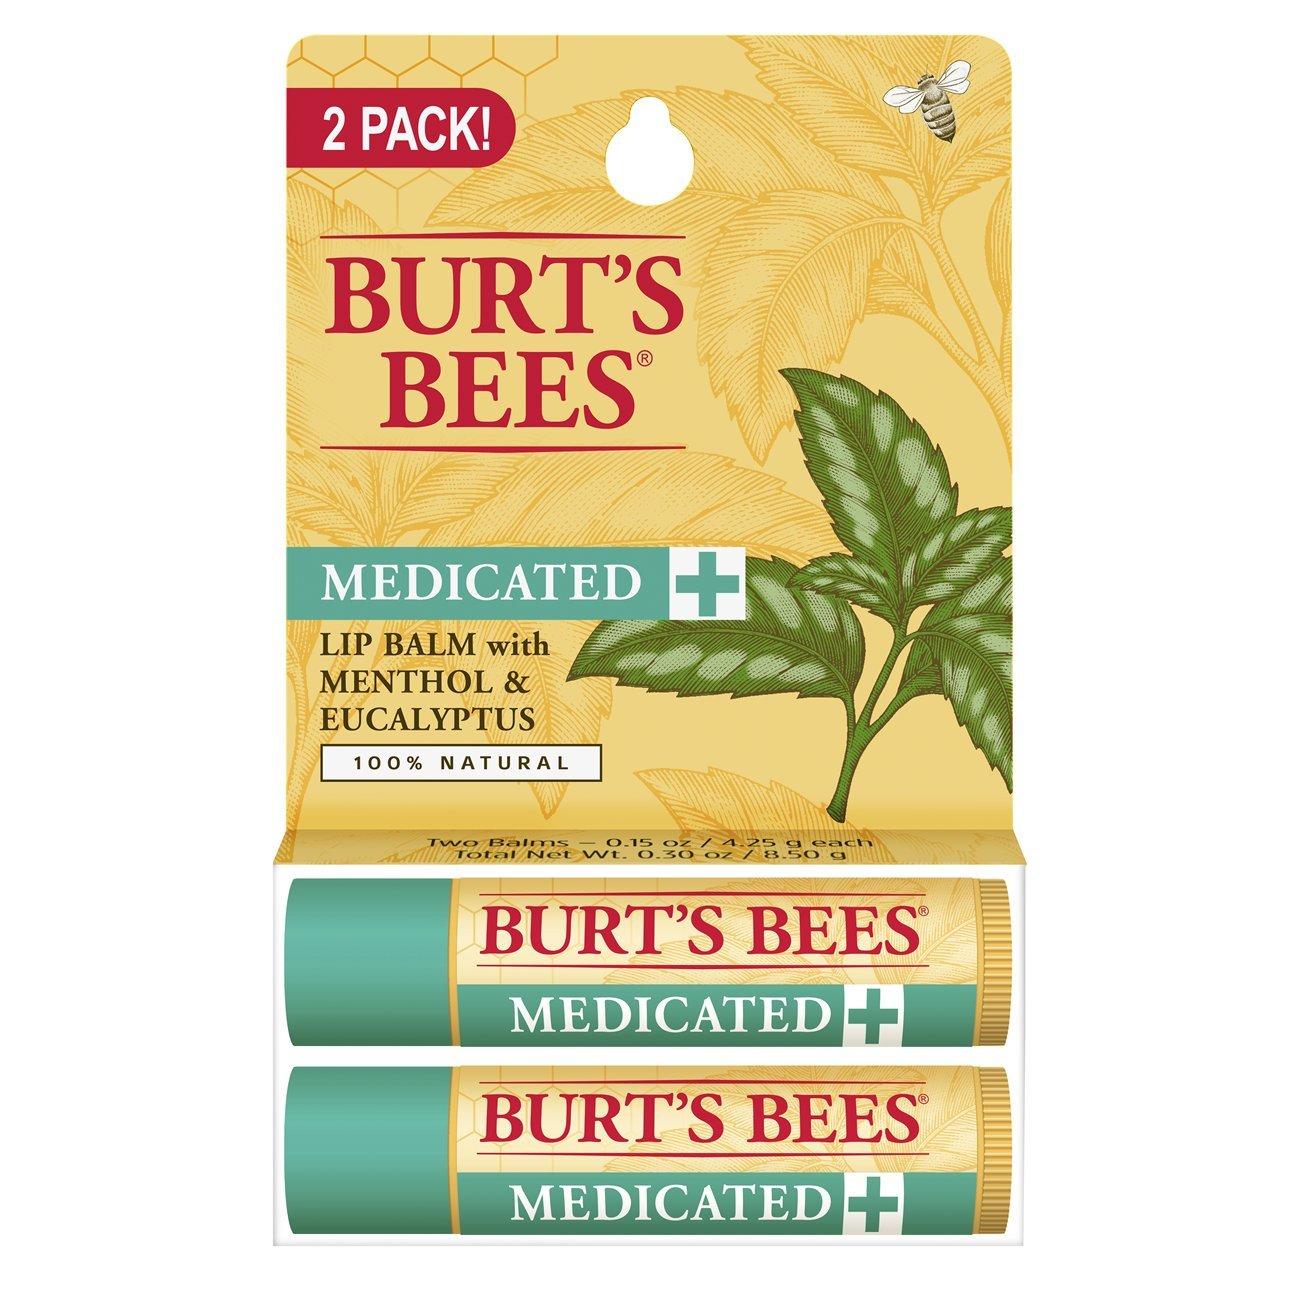 Burt's Bees 100% Natural Medicated Moisturizing Lip Balm with Menthol & Eucalyptus - 2 Tubes